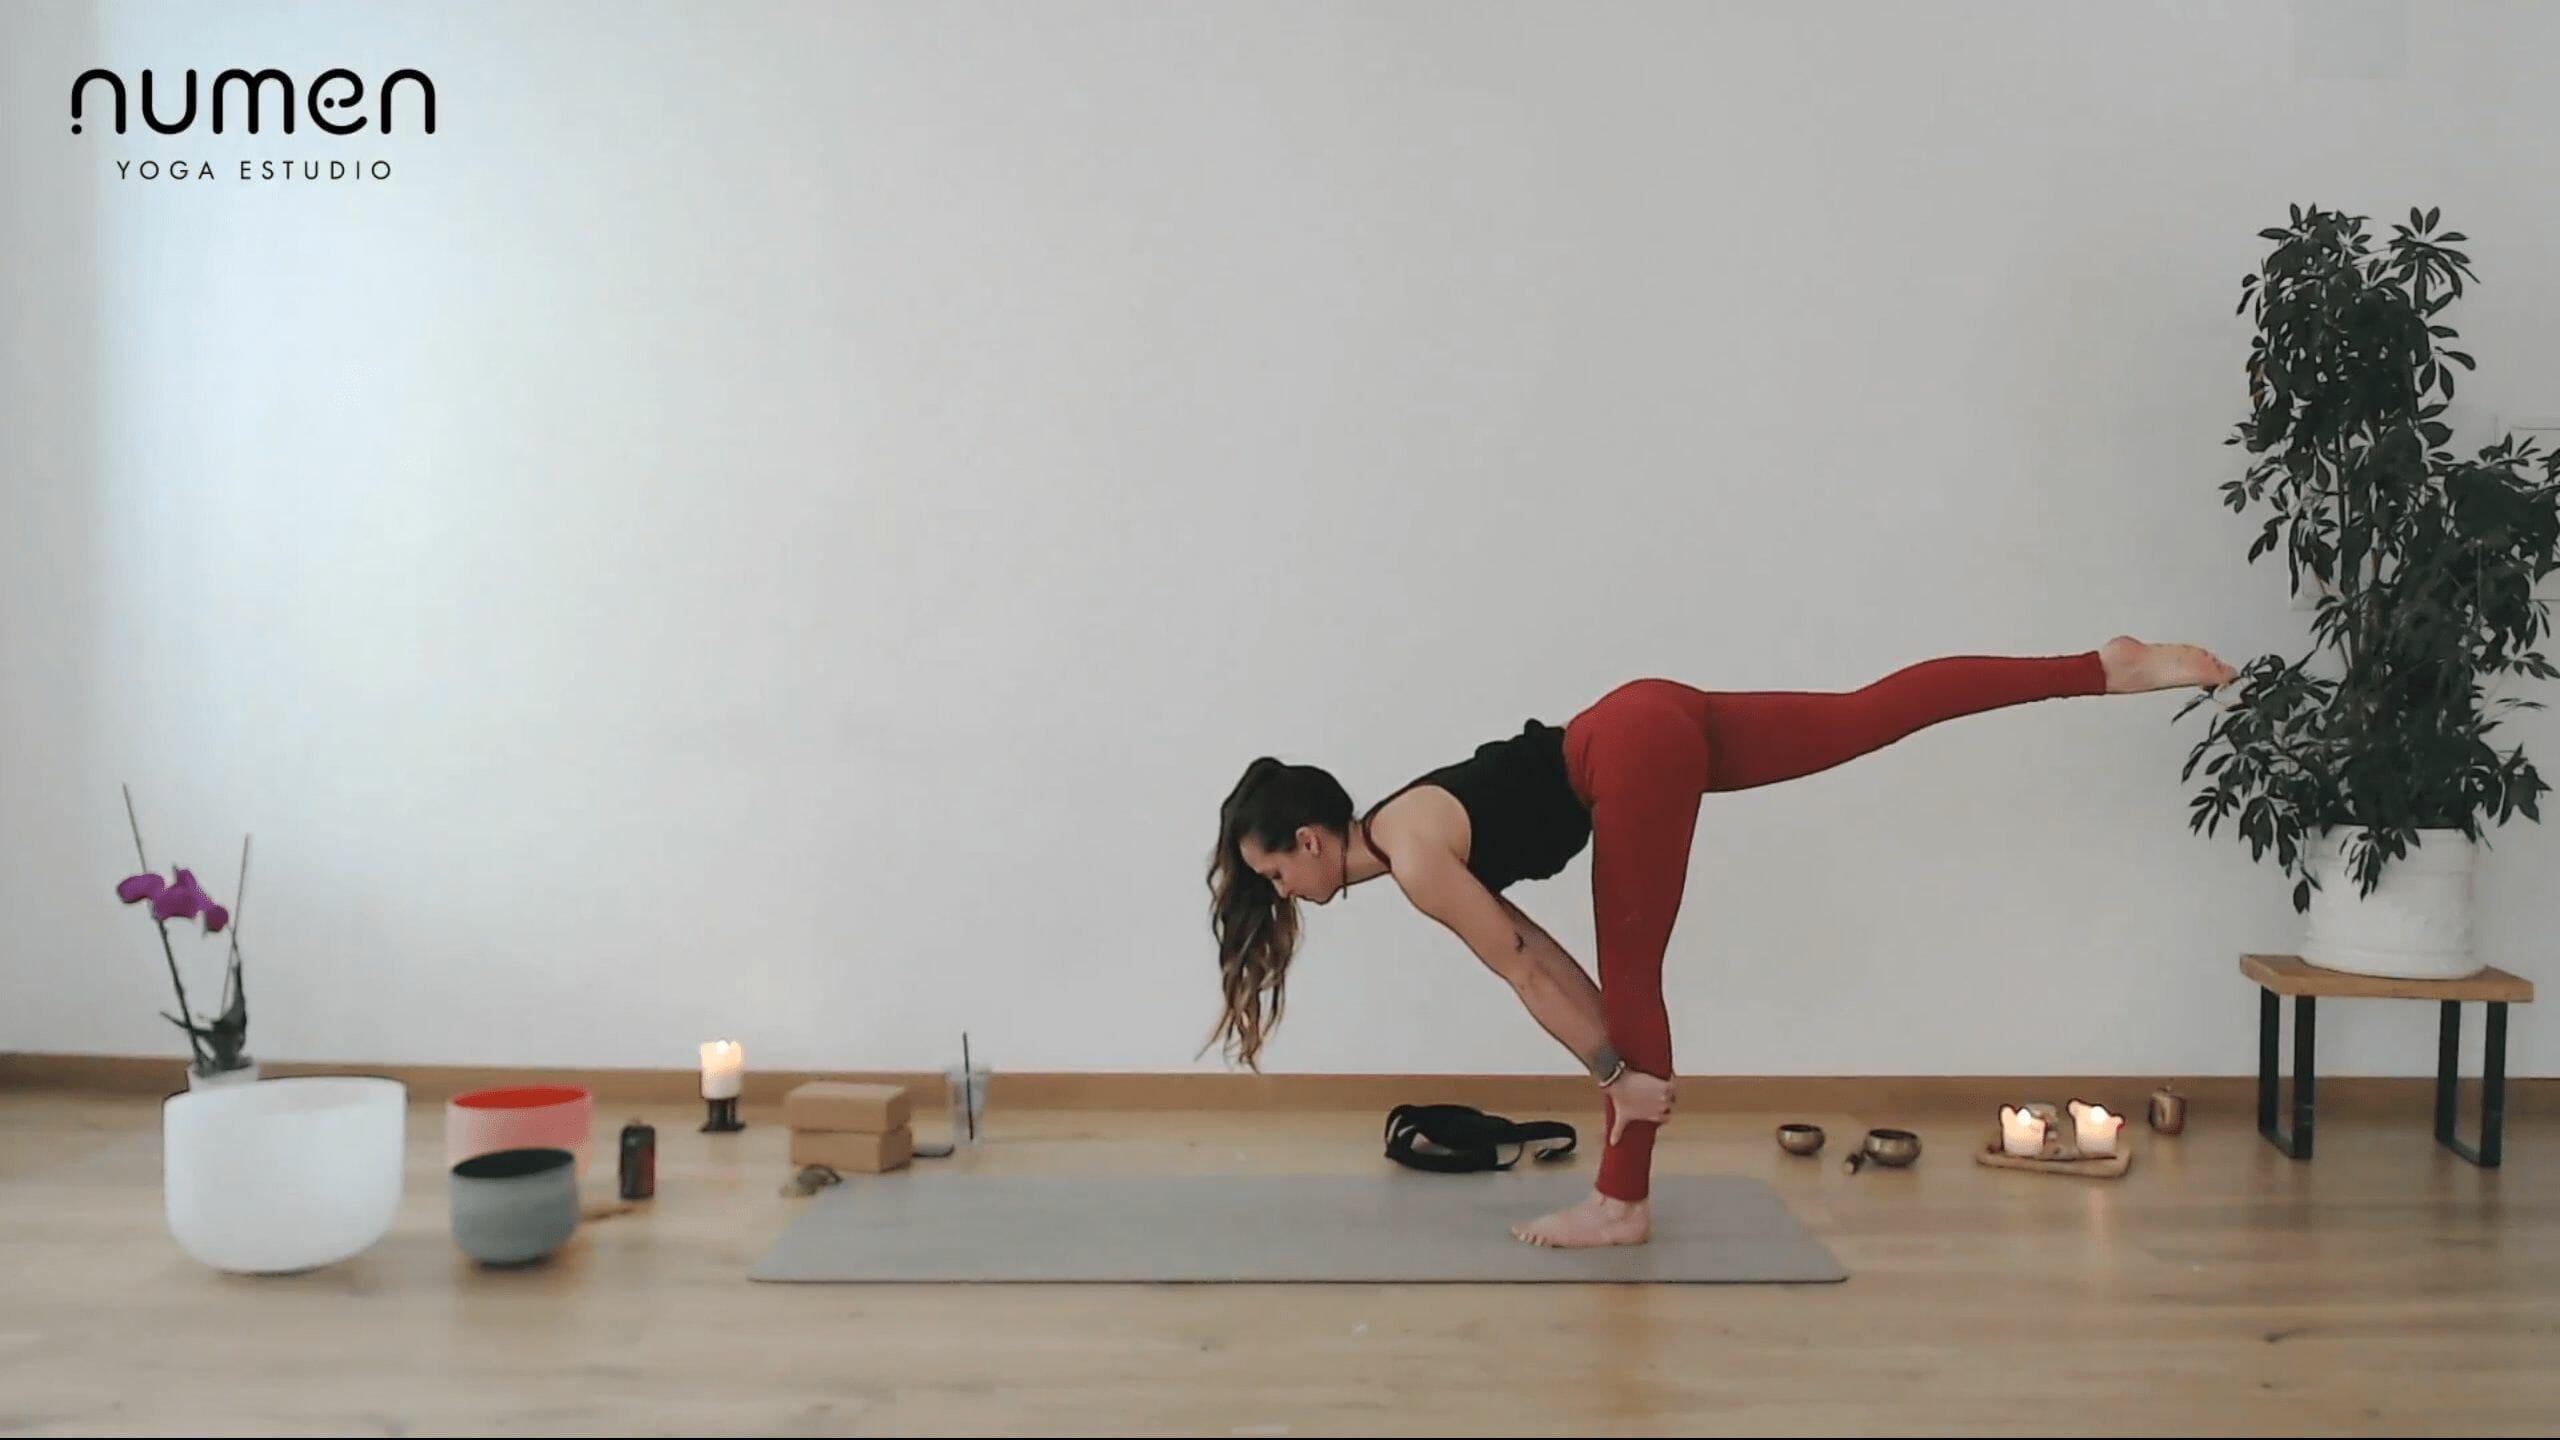 Vinyasa multinivel equilibrios y standing split